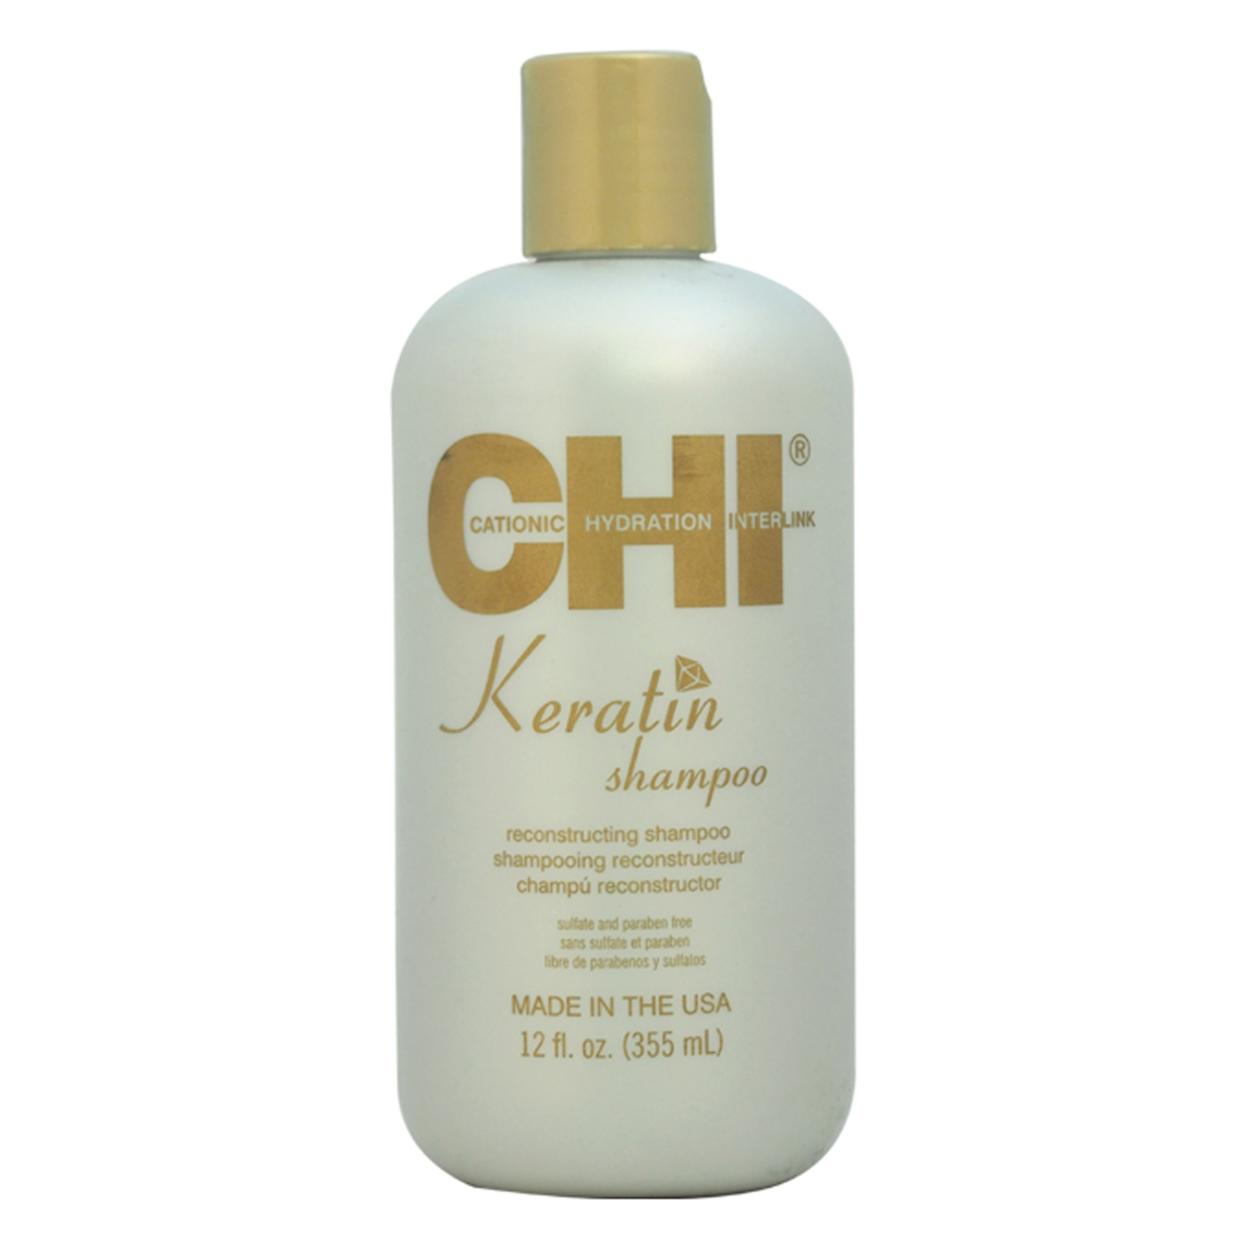 Keratin Reconstructing Shampoo by CHI for Unisex - 12 oz Shampoo 58653c46e2246122db0f2074